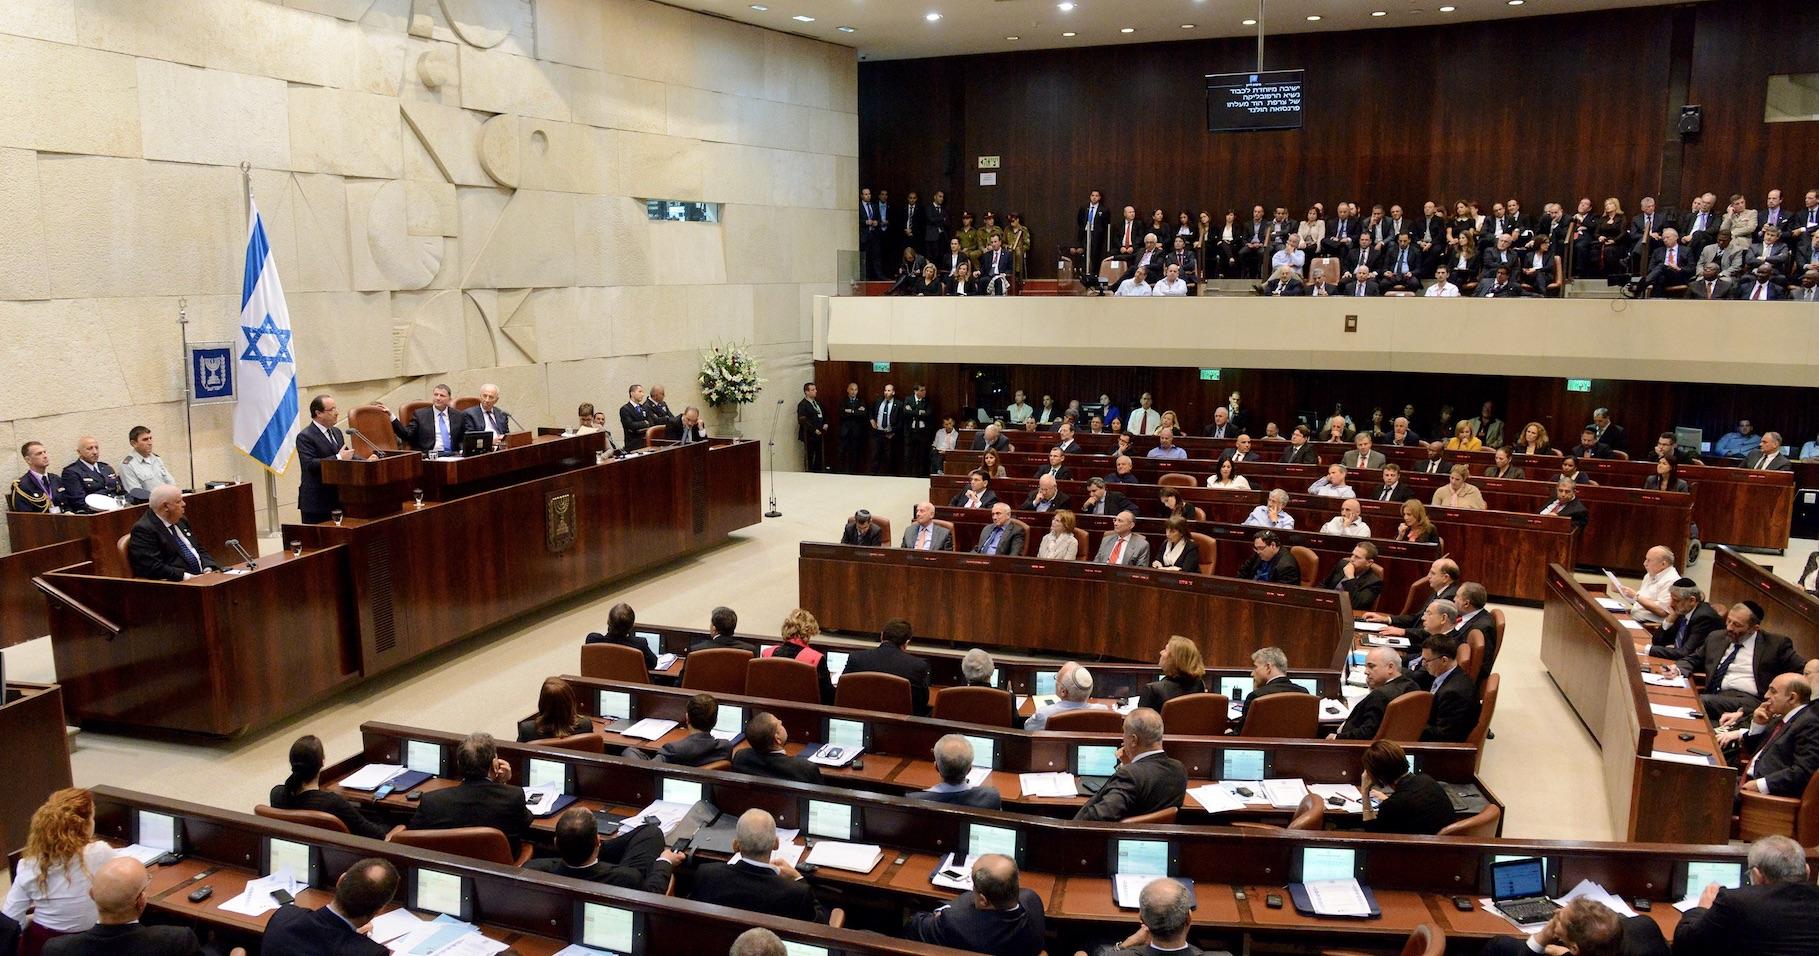 Giulia Daniele comenta a nova lei aprovada no Parlamento de Israel [EN]